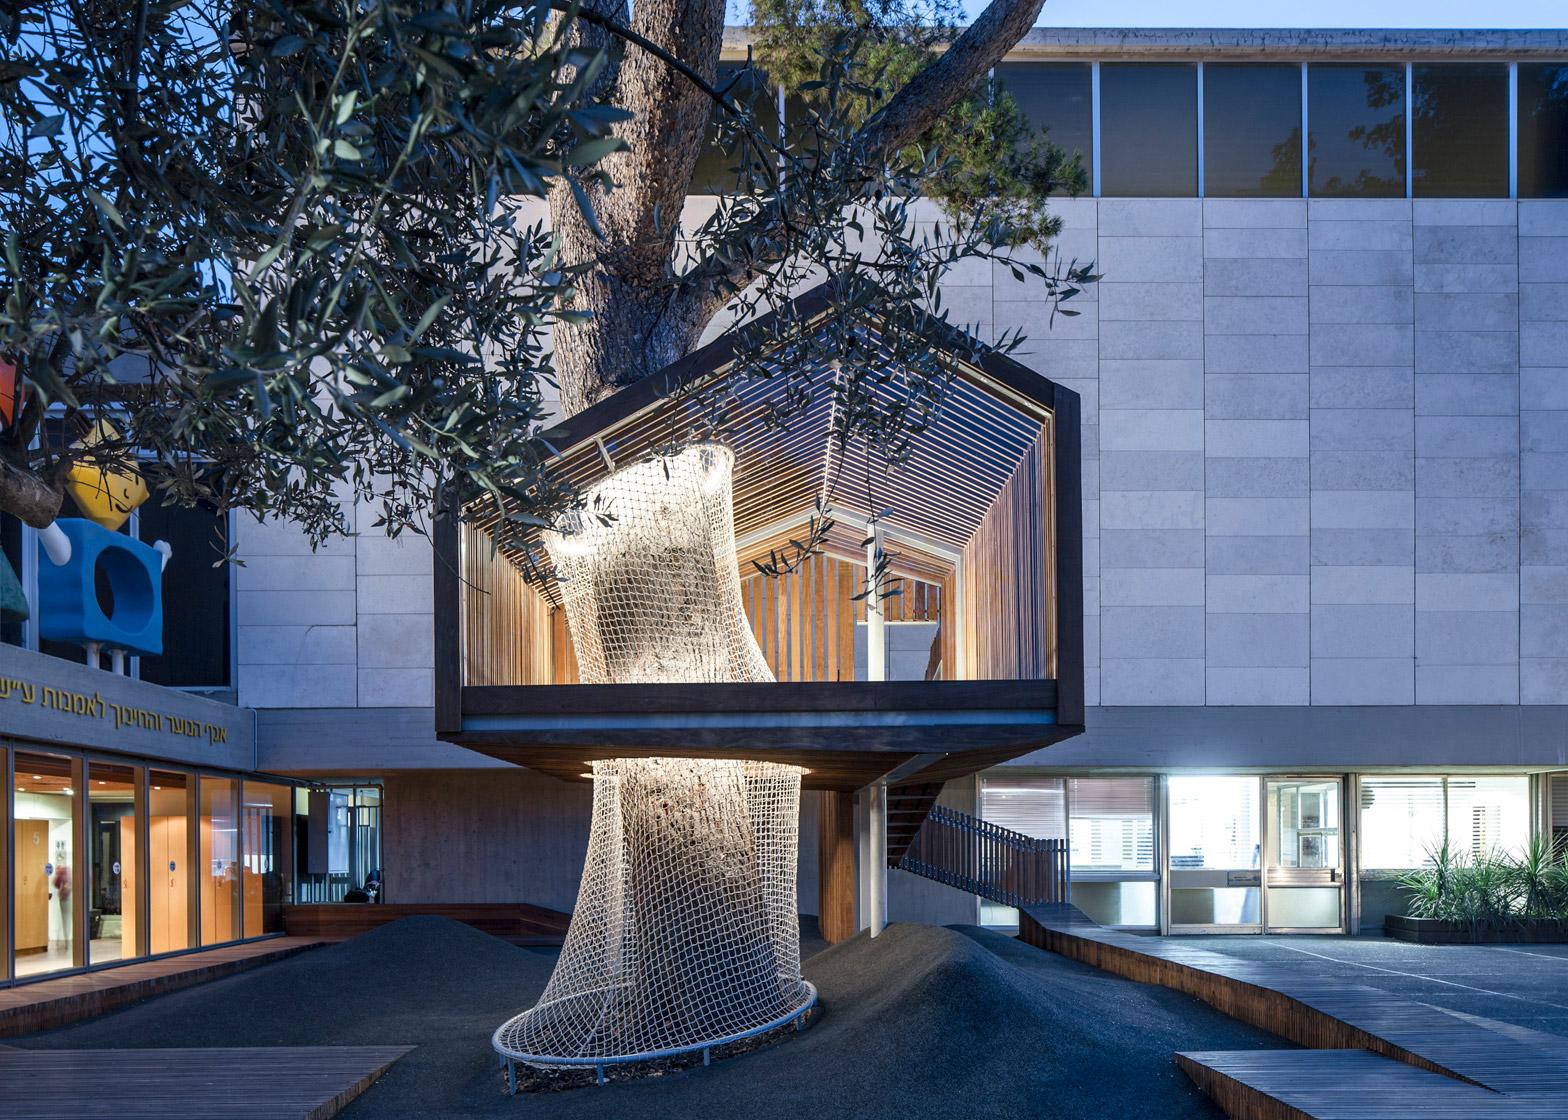 Imj tree house by ifat finkelman and deborah warschawski for In design homes